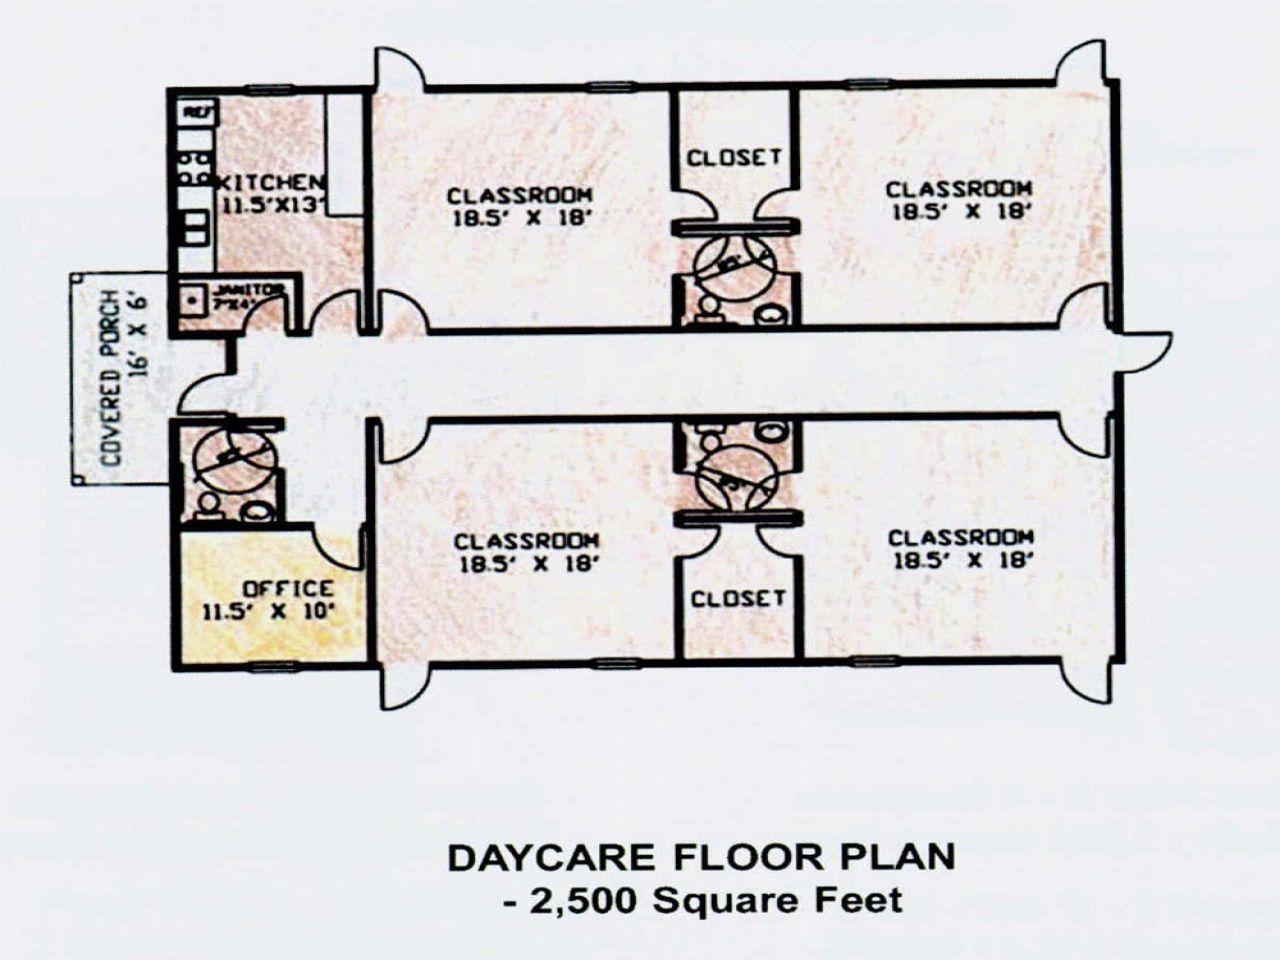 Daycare Center Floor Plans Day Care Classroom Floor Plan